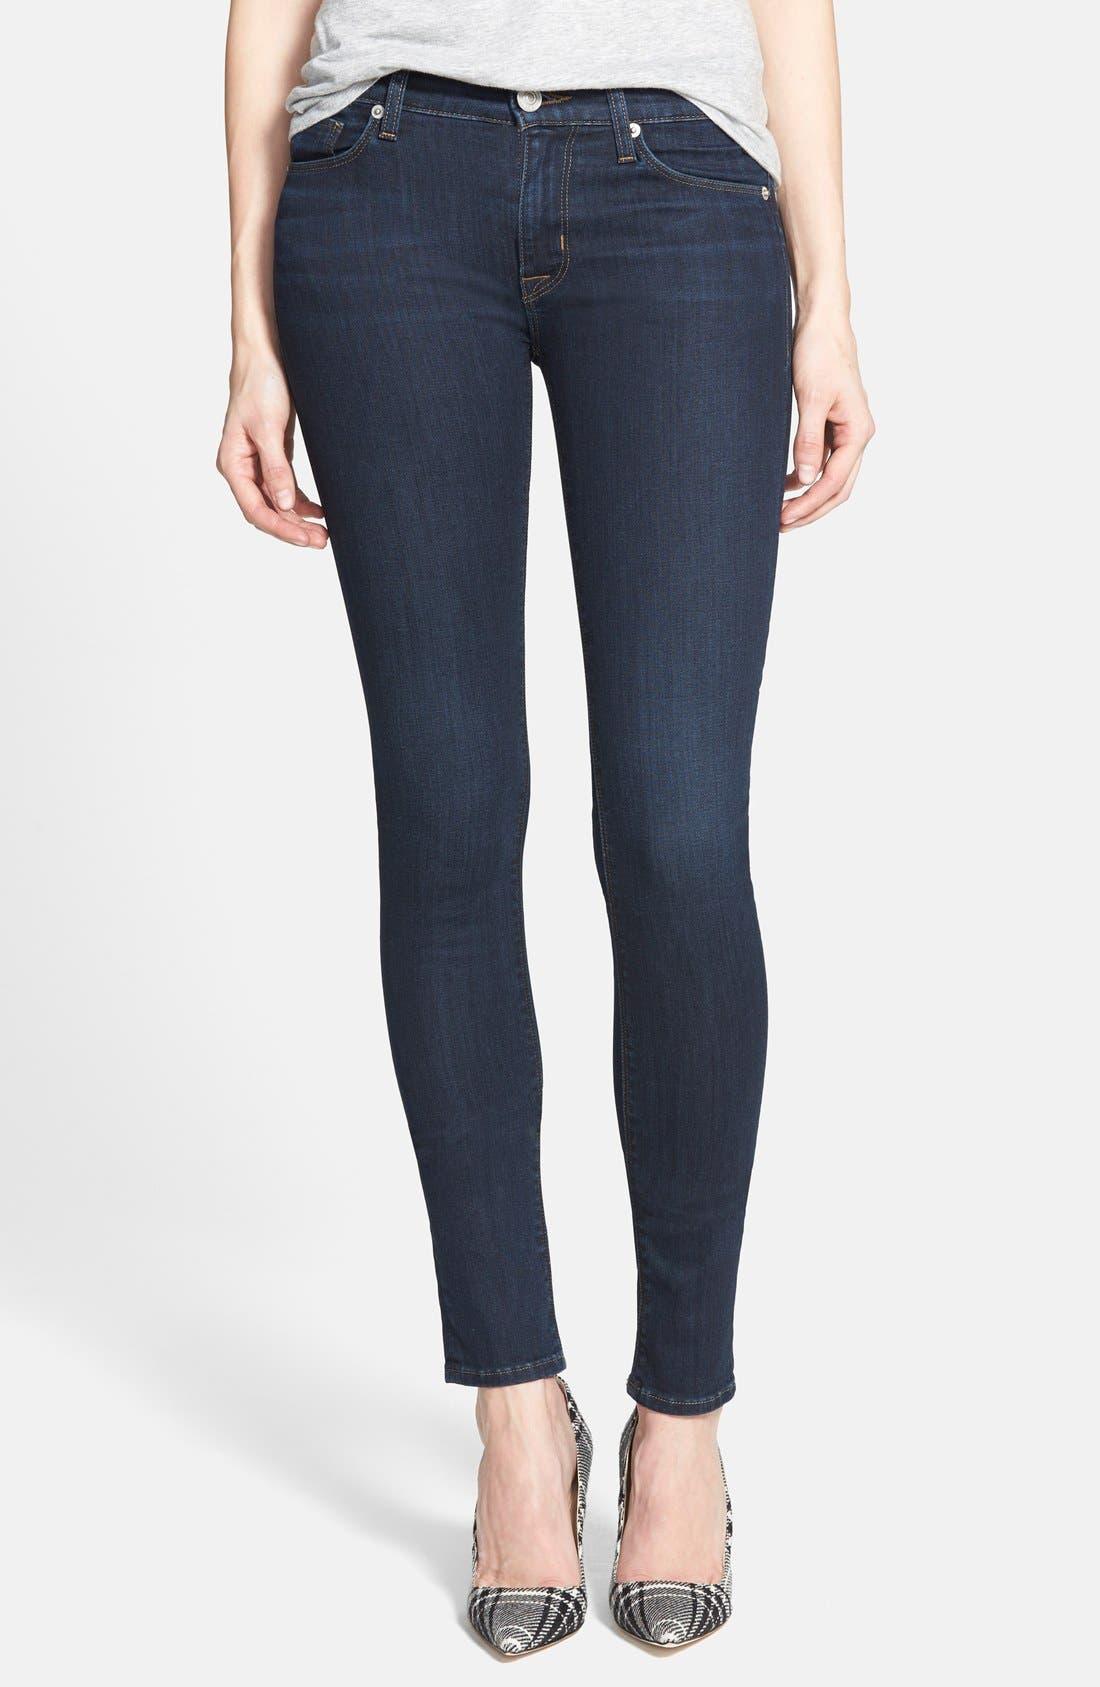 Main Image - Hudson Jeans Mid Rise Skinny Jeans (Problem Child)